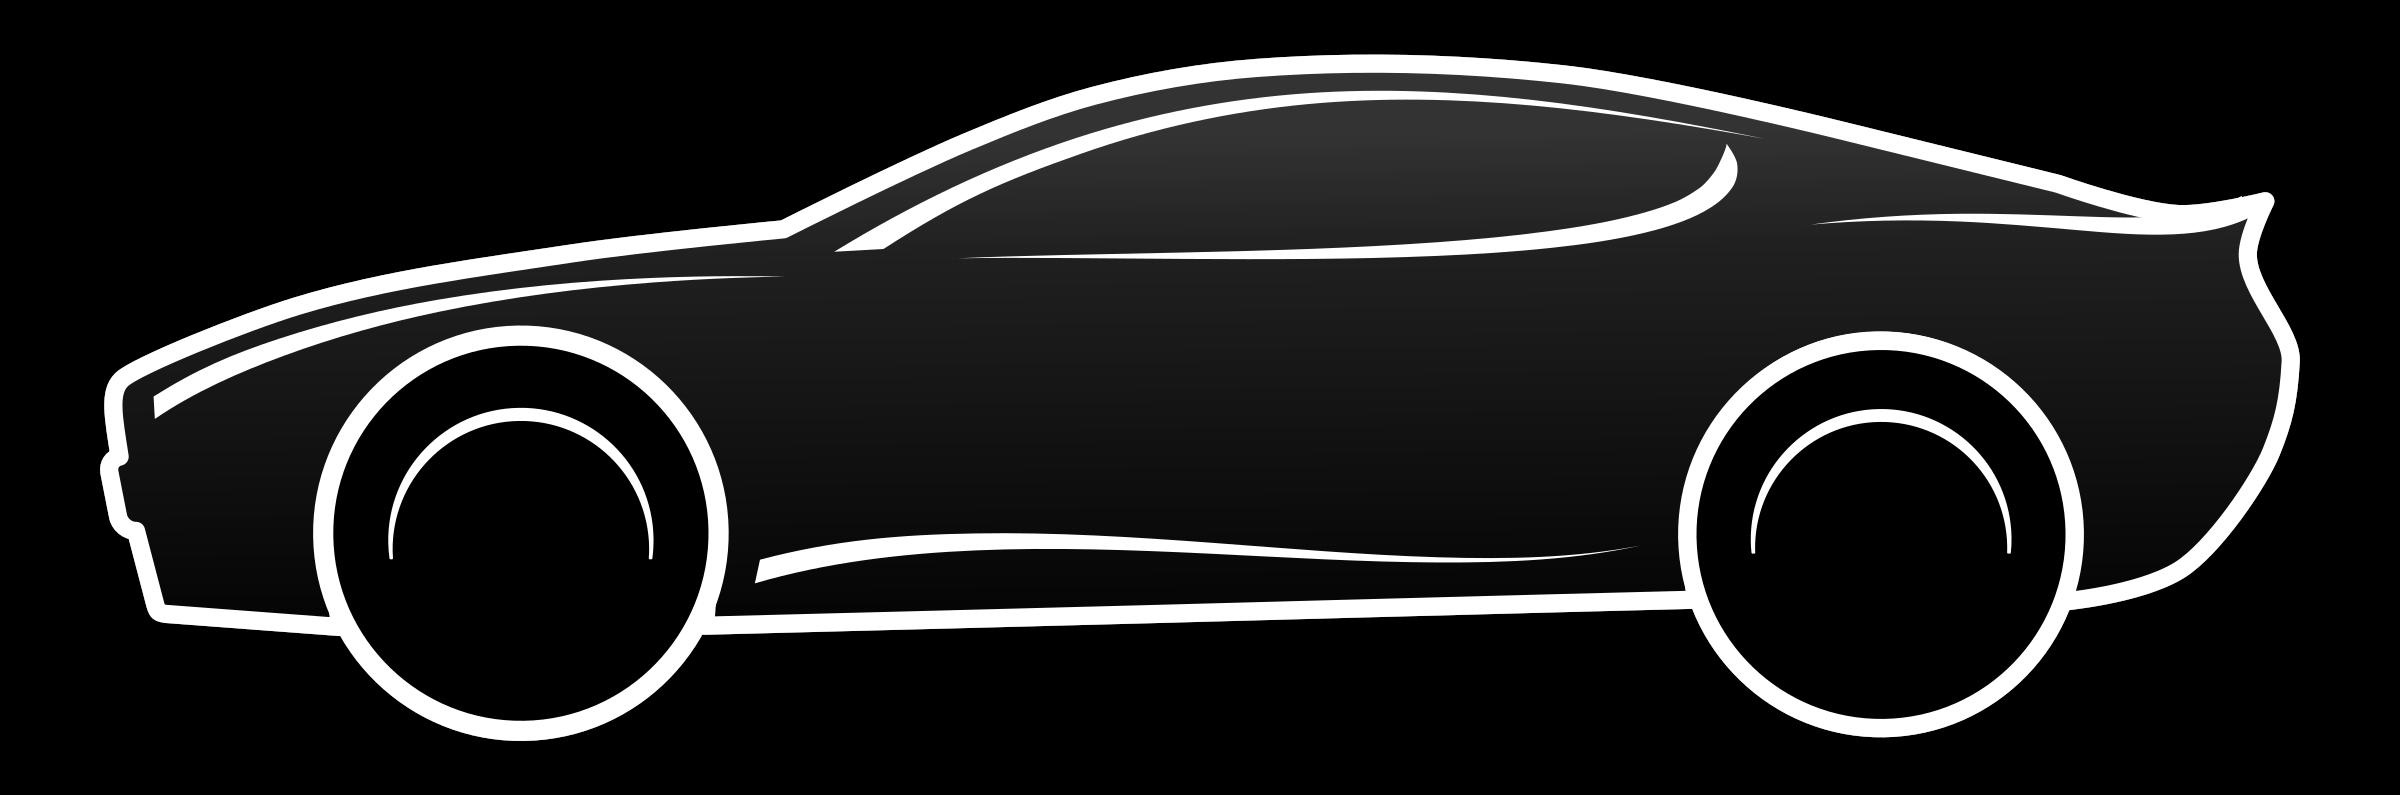 Clip Art Car Tuning Images